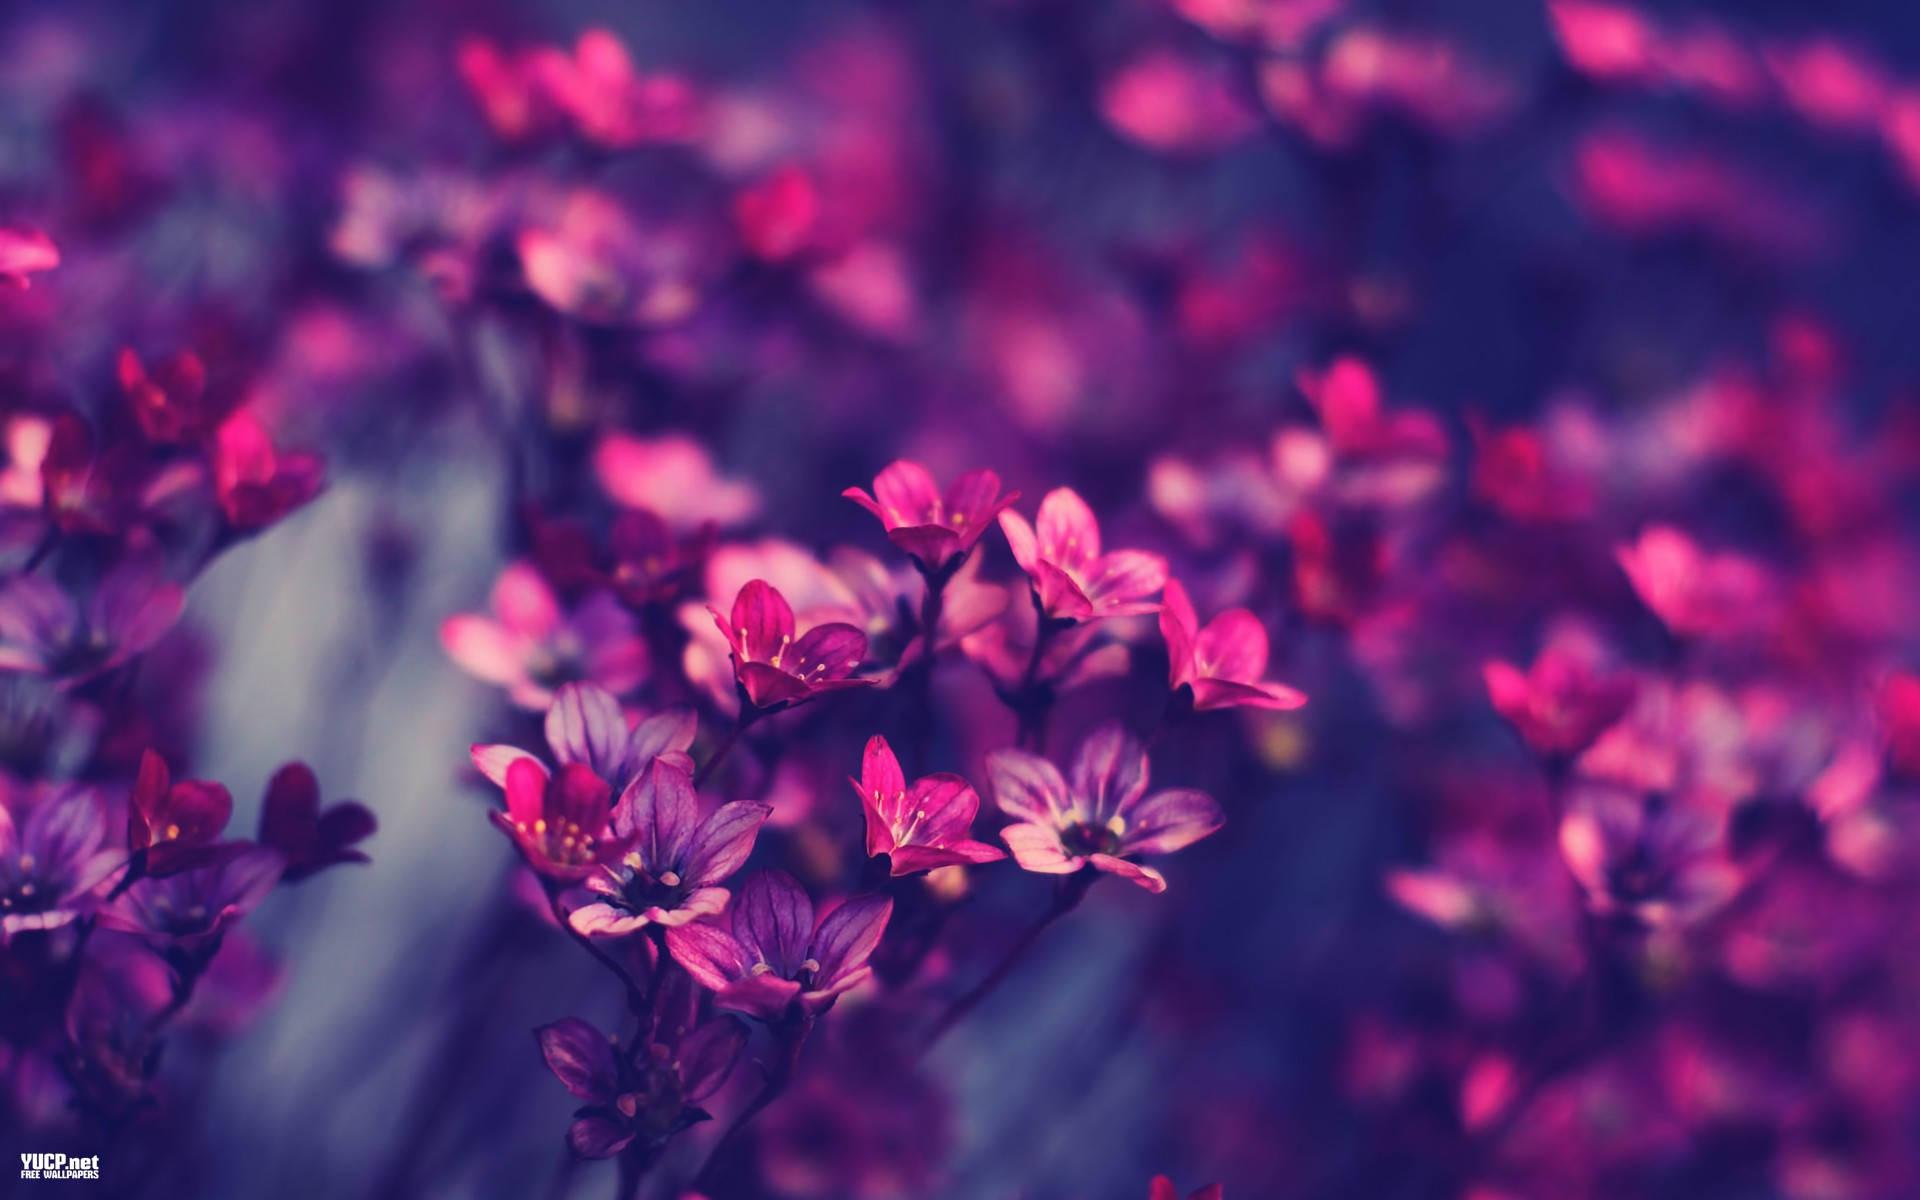 Vintage Flowers Wallpaper 1920x1200 51917